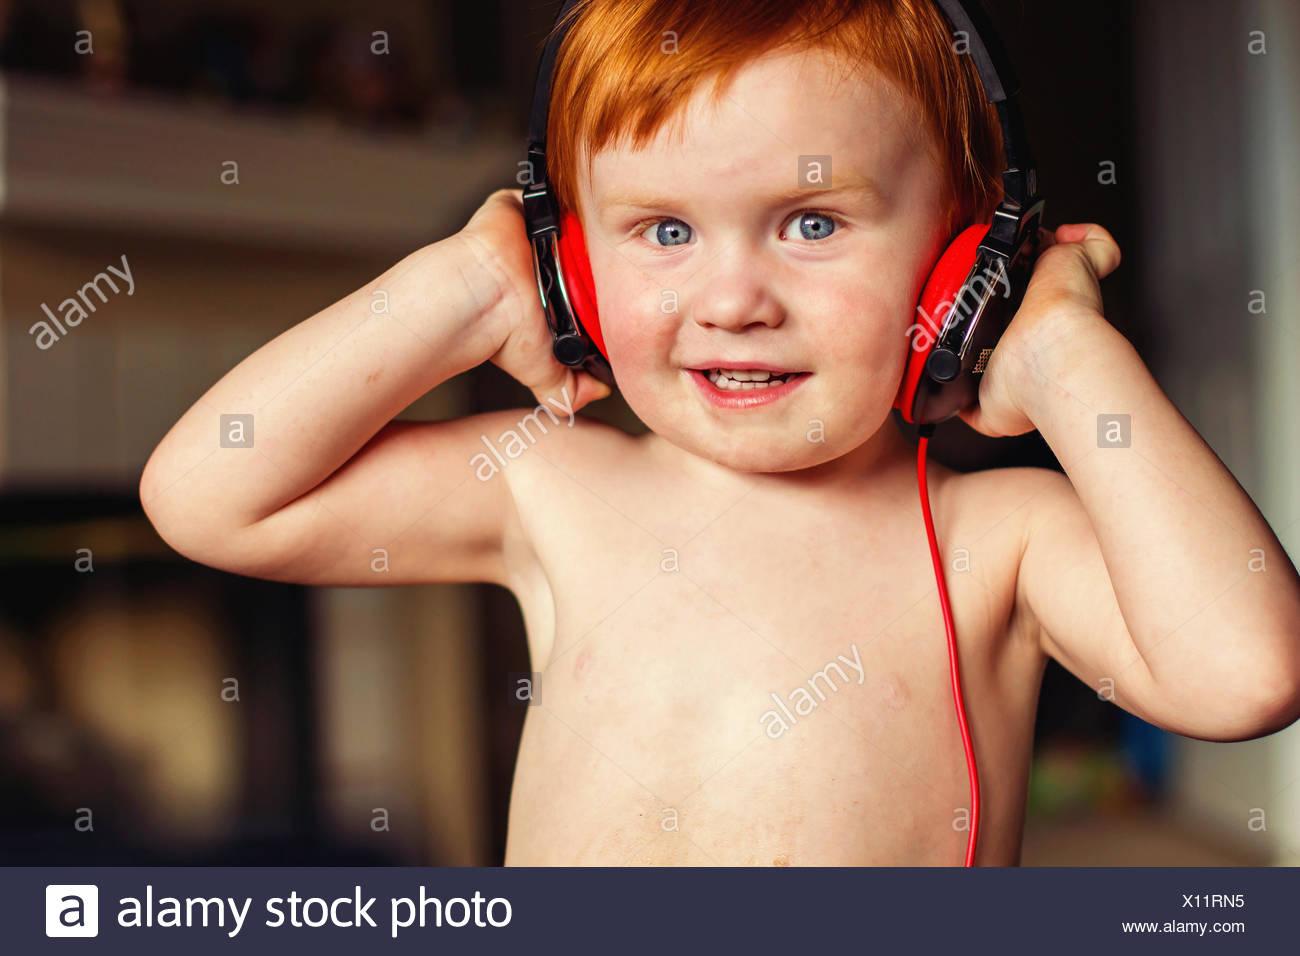 Junge mit Kopfhörern Musik hören Stockbild